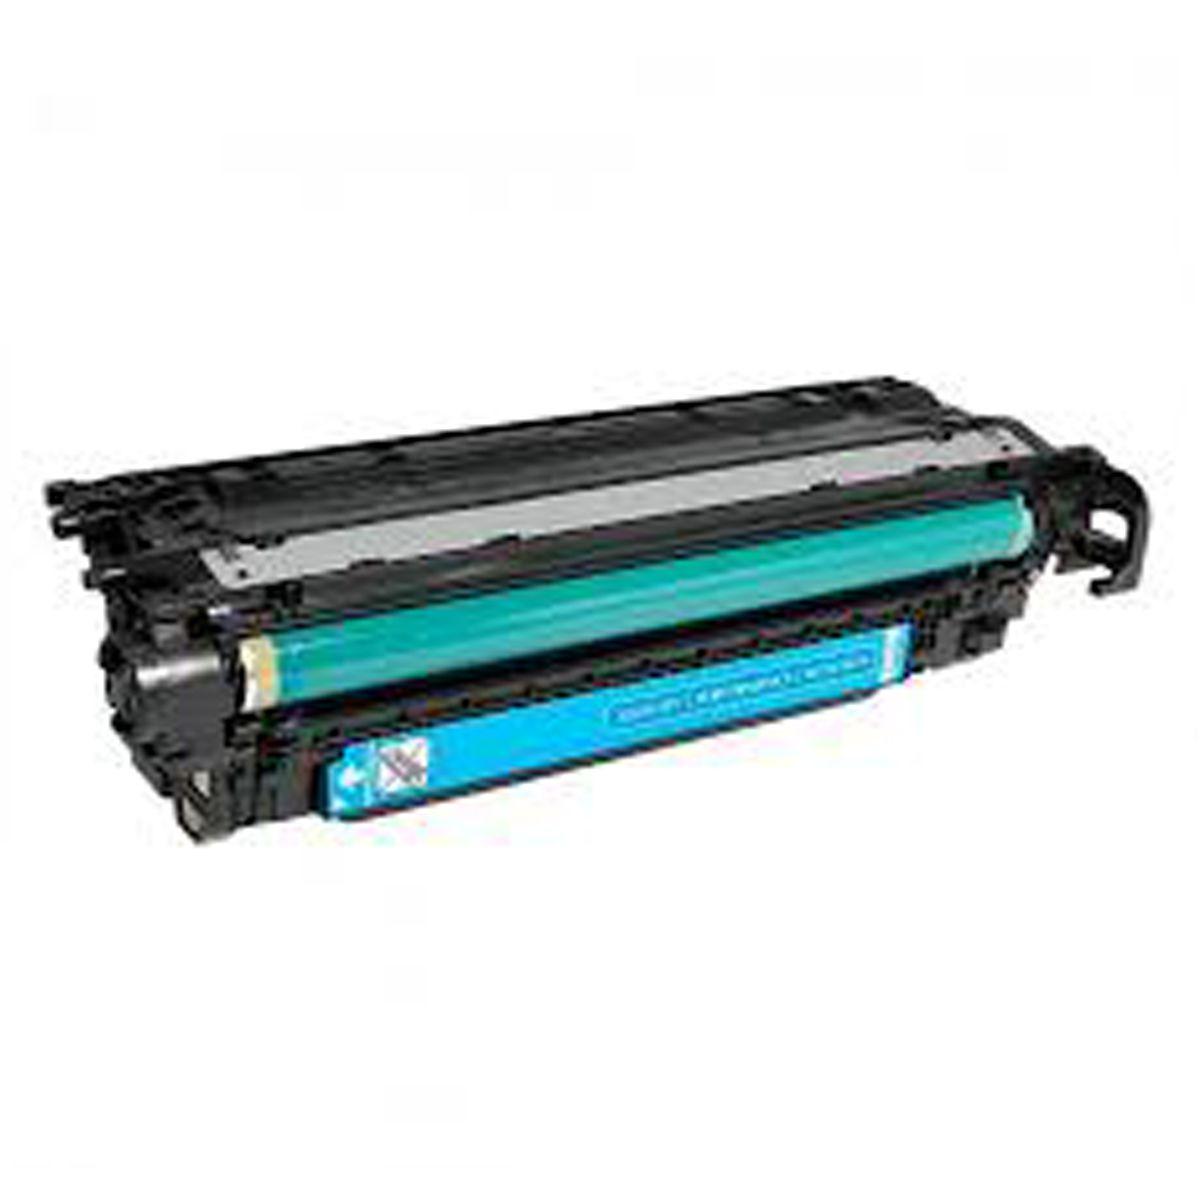 Toner CE401A CE401A 507A - CP-4005 M575 M551DN M570 - Ciano 5K